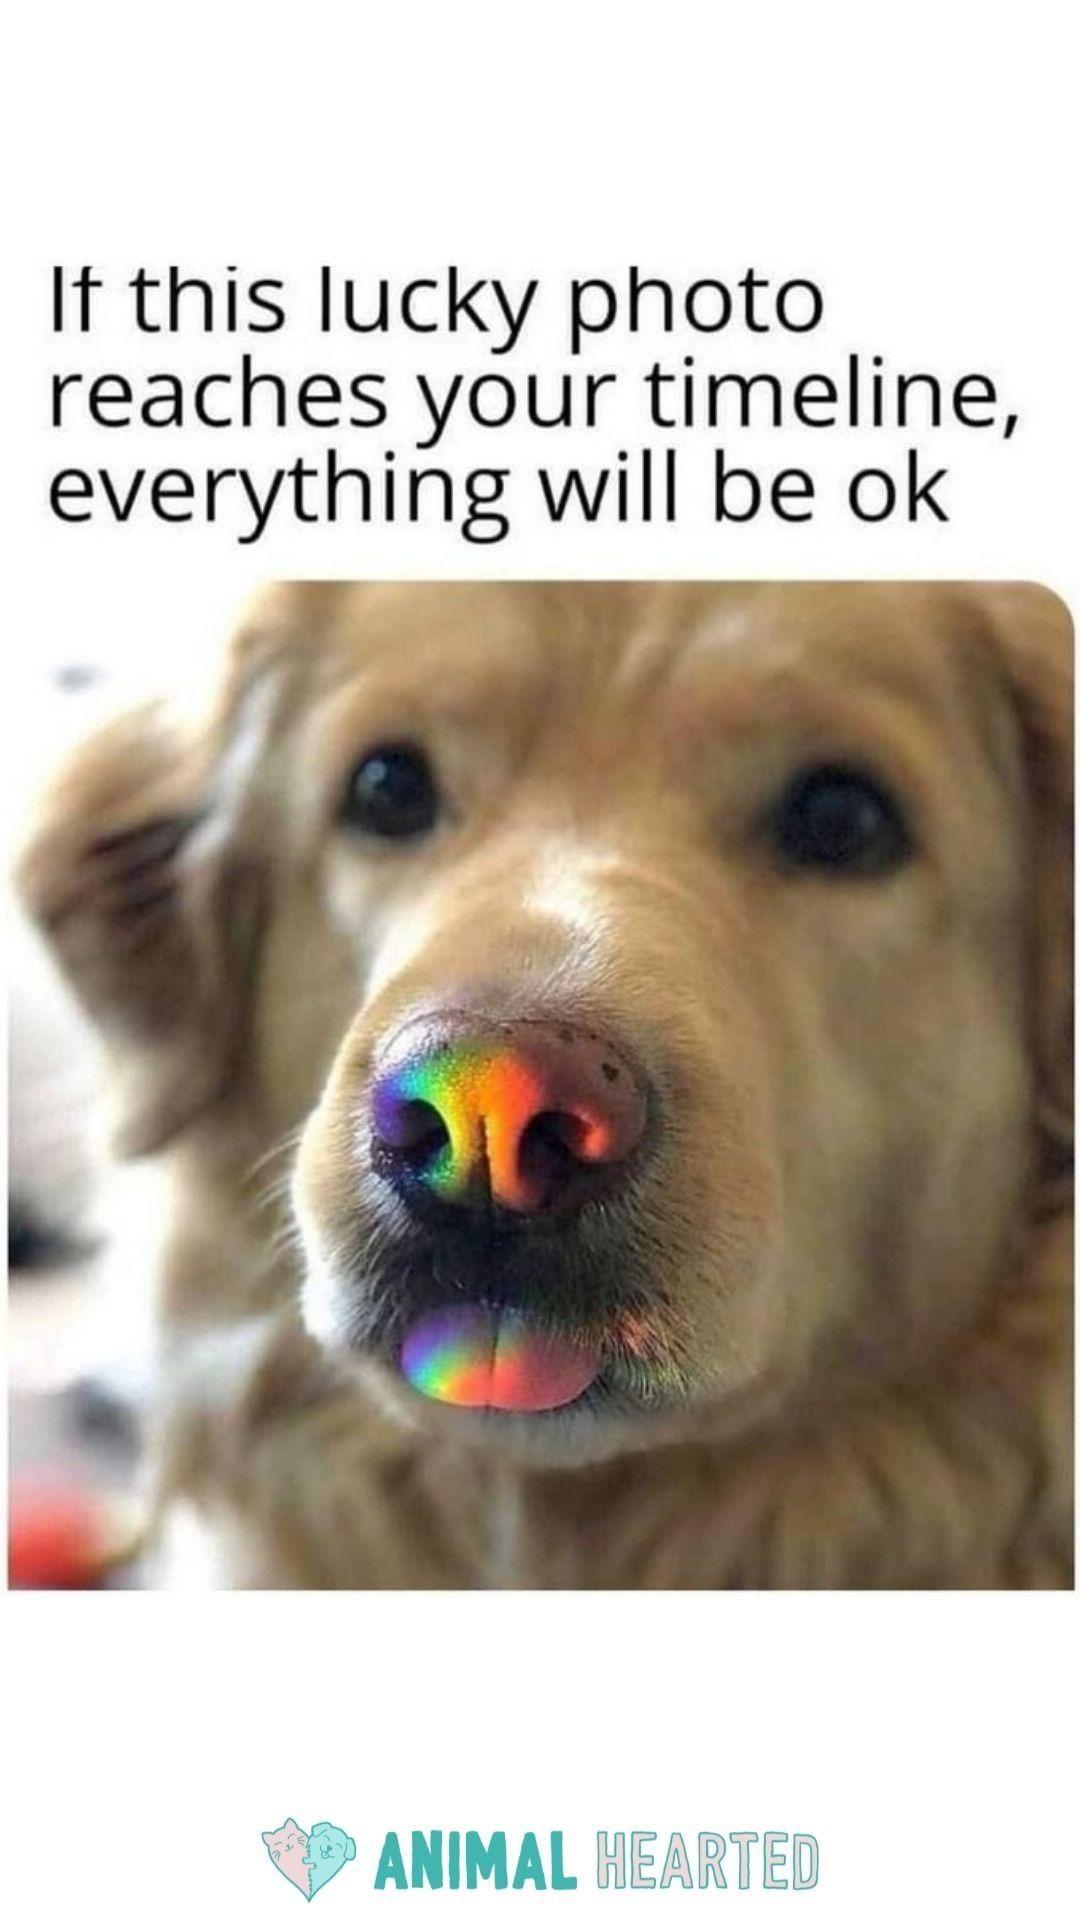 Cute Animal Memes   Animal Hearted Apparel